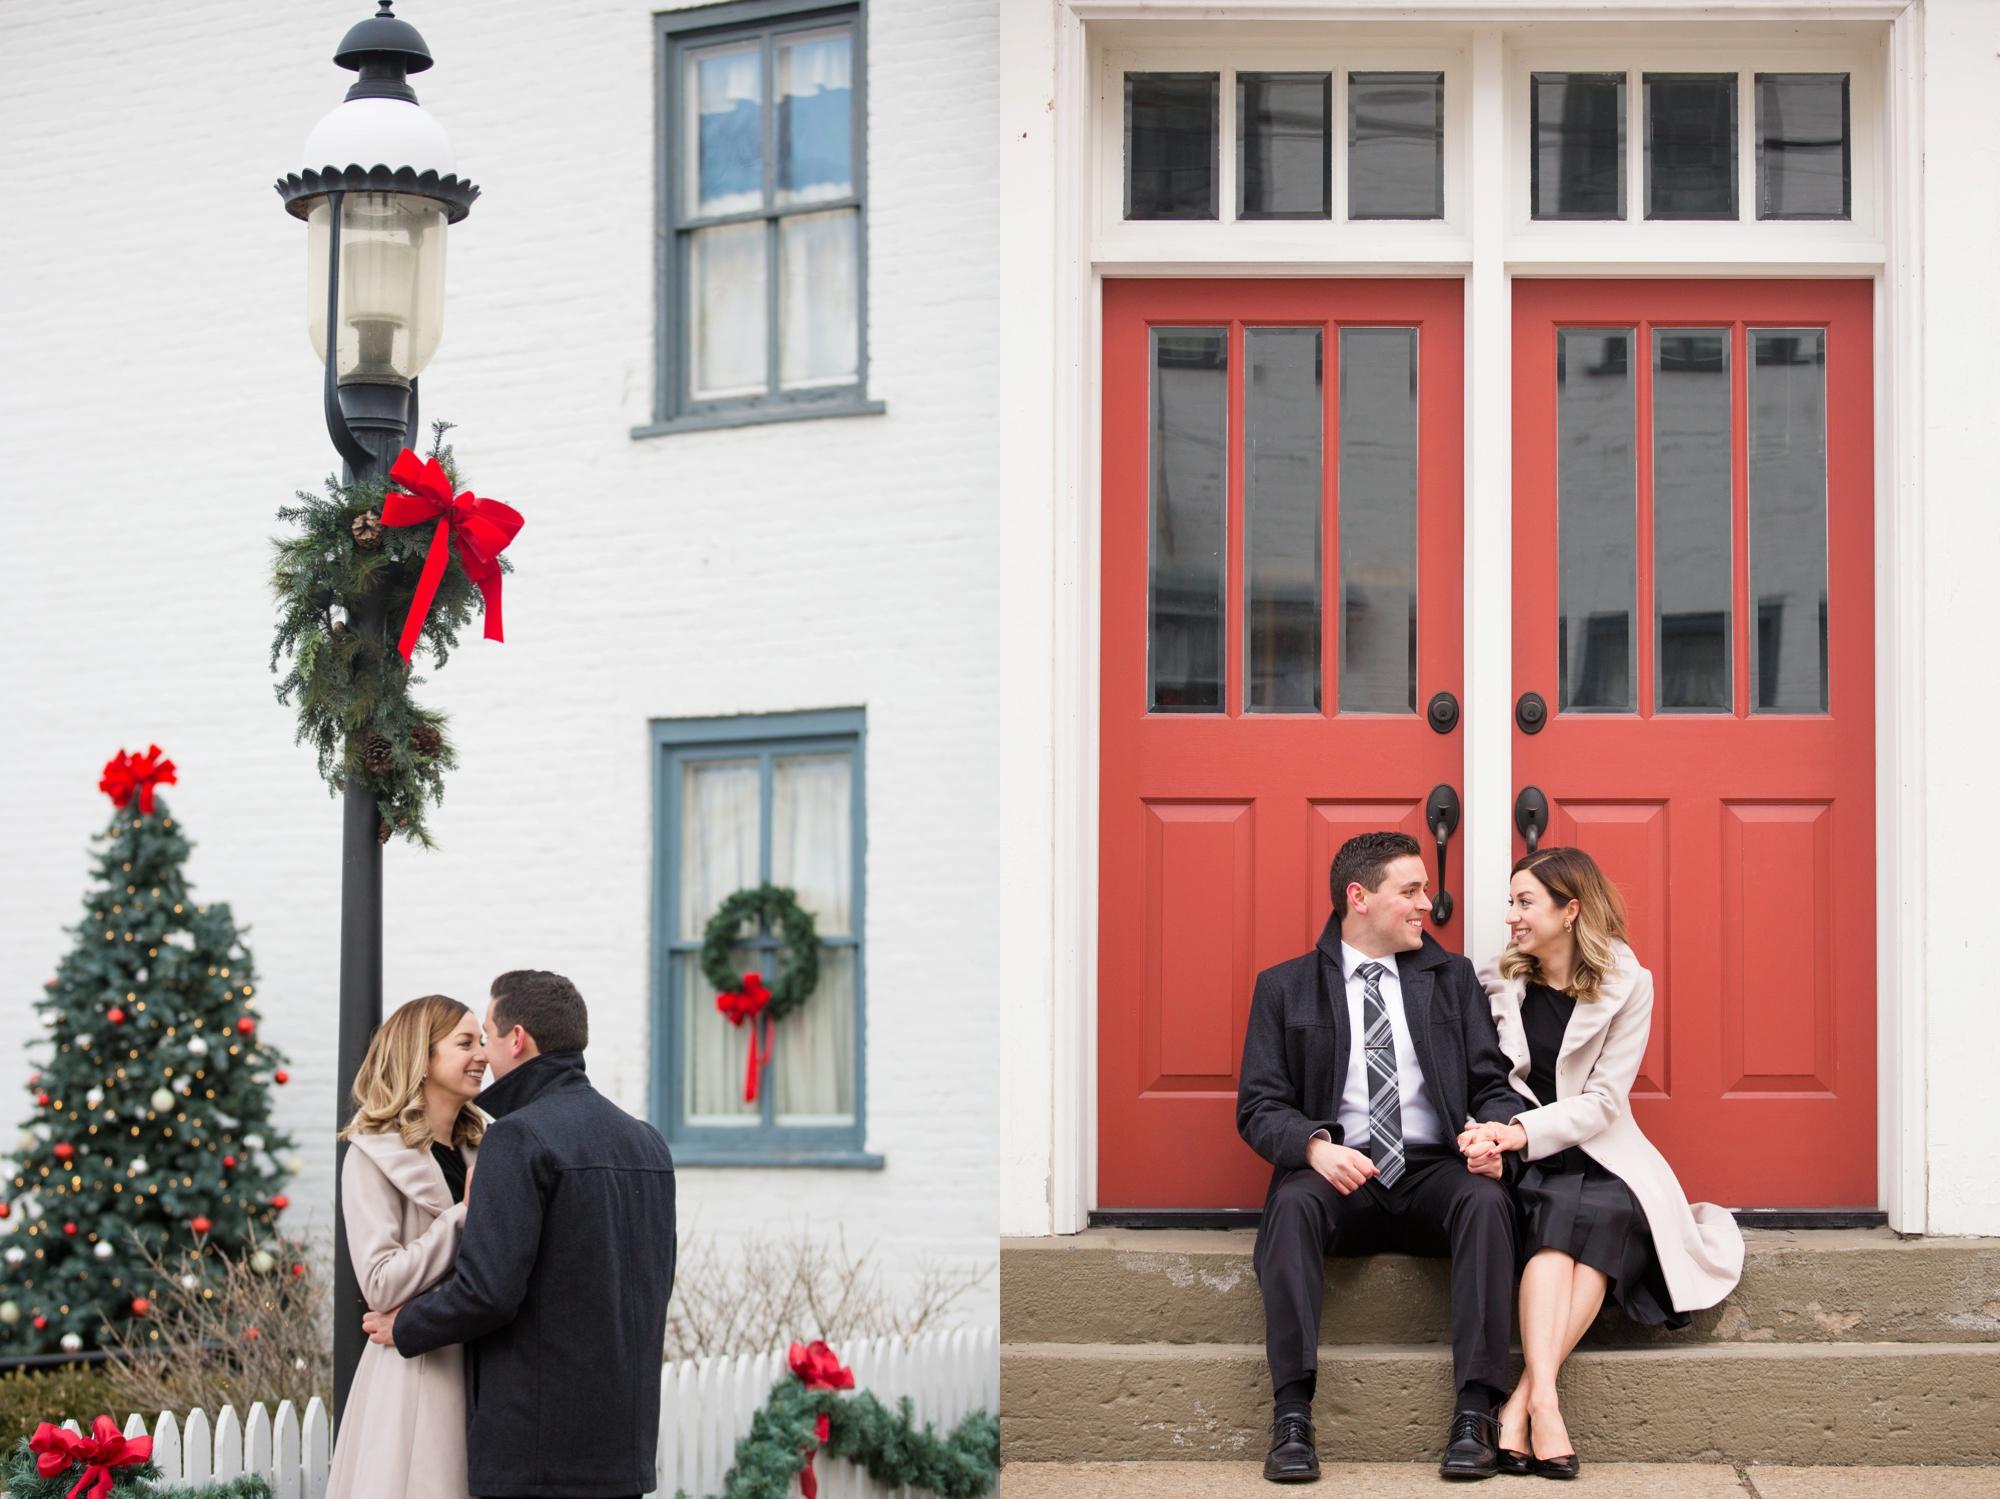 pittsburgh wedding photographer, pittsburgh wedding venues, cranberry township wedding photographer, zelienople wedding photographer, wunderbar coffee house